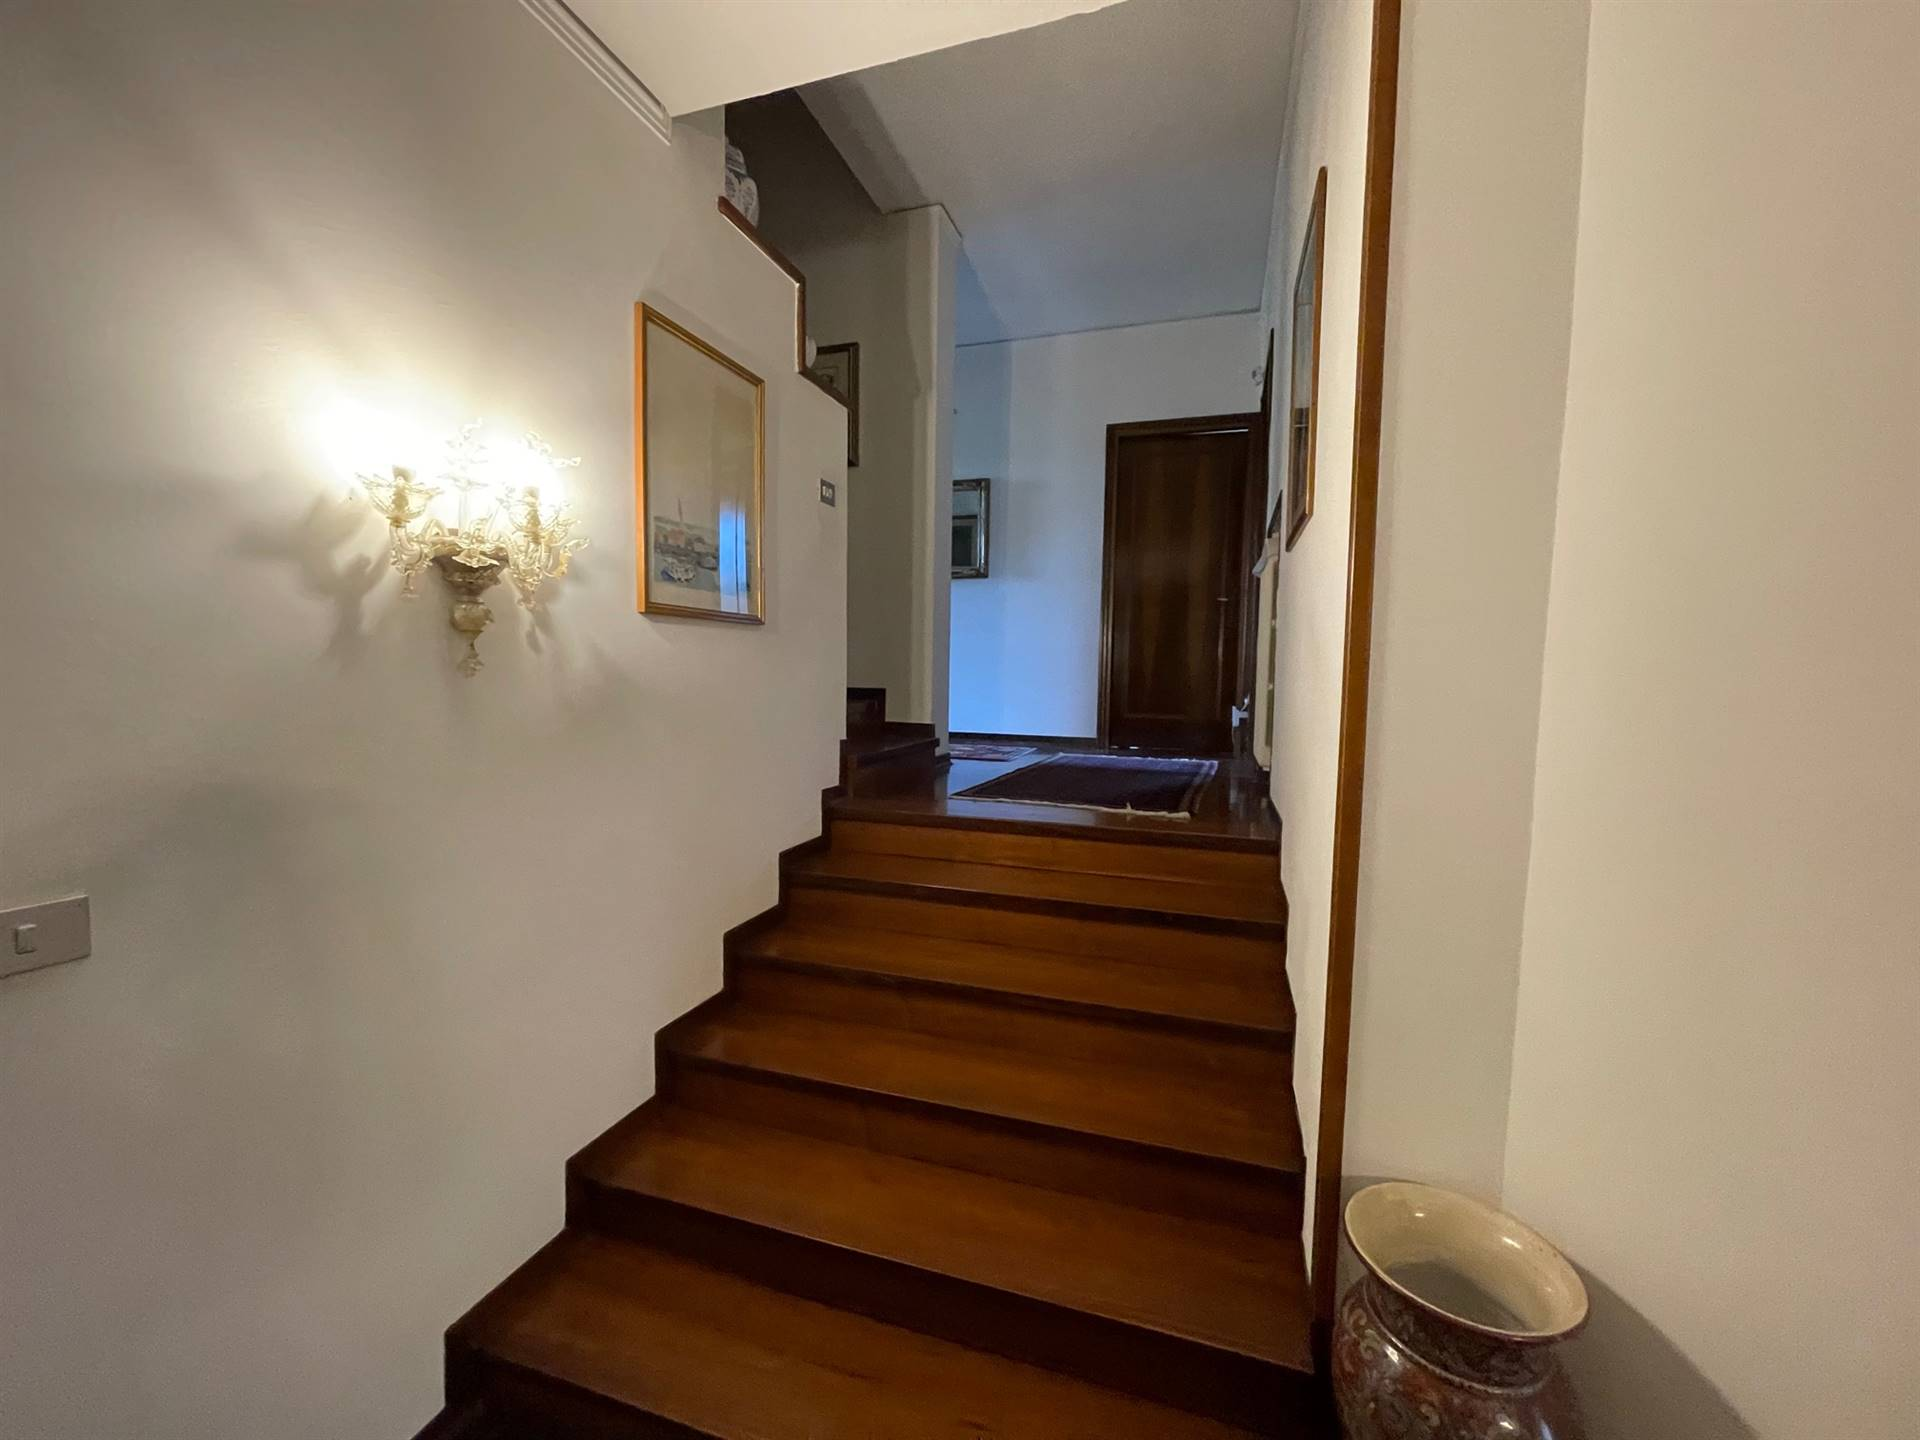 vano scale villa Zelarino Mestre Studio C